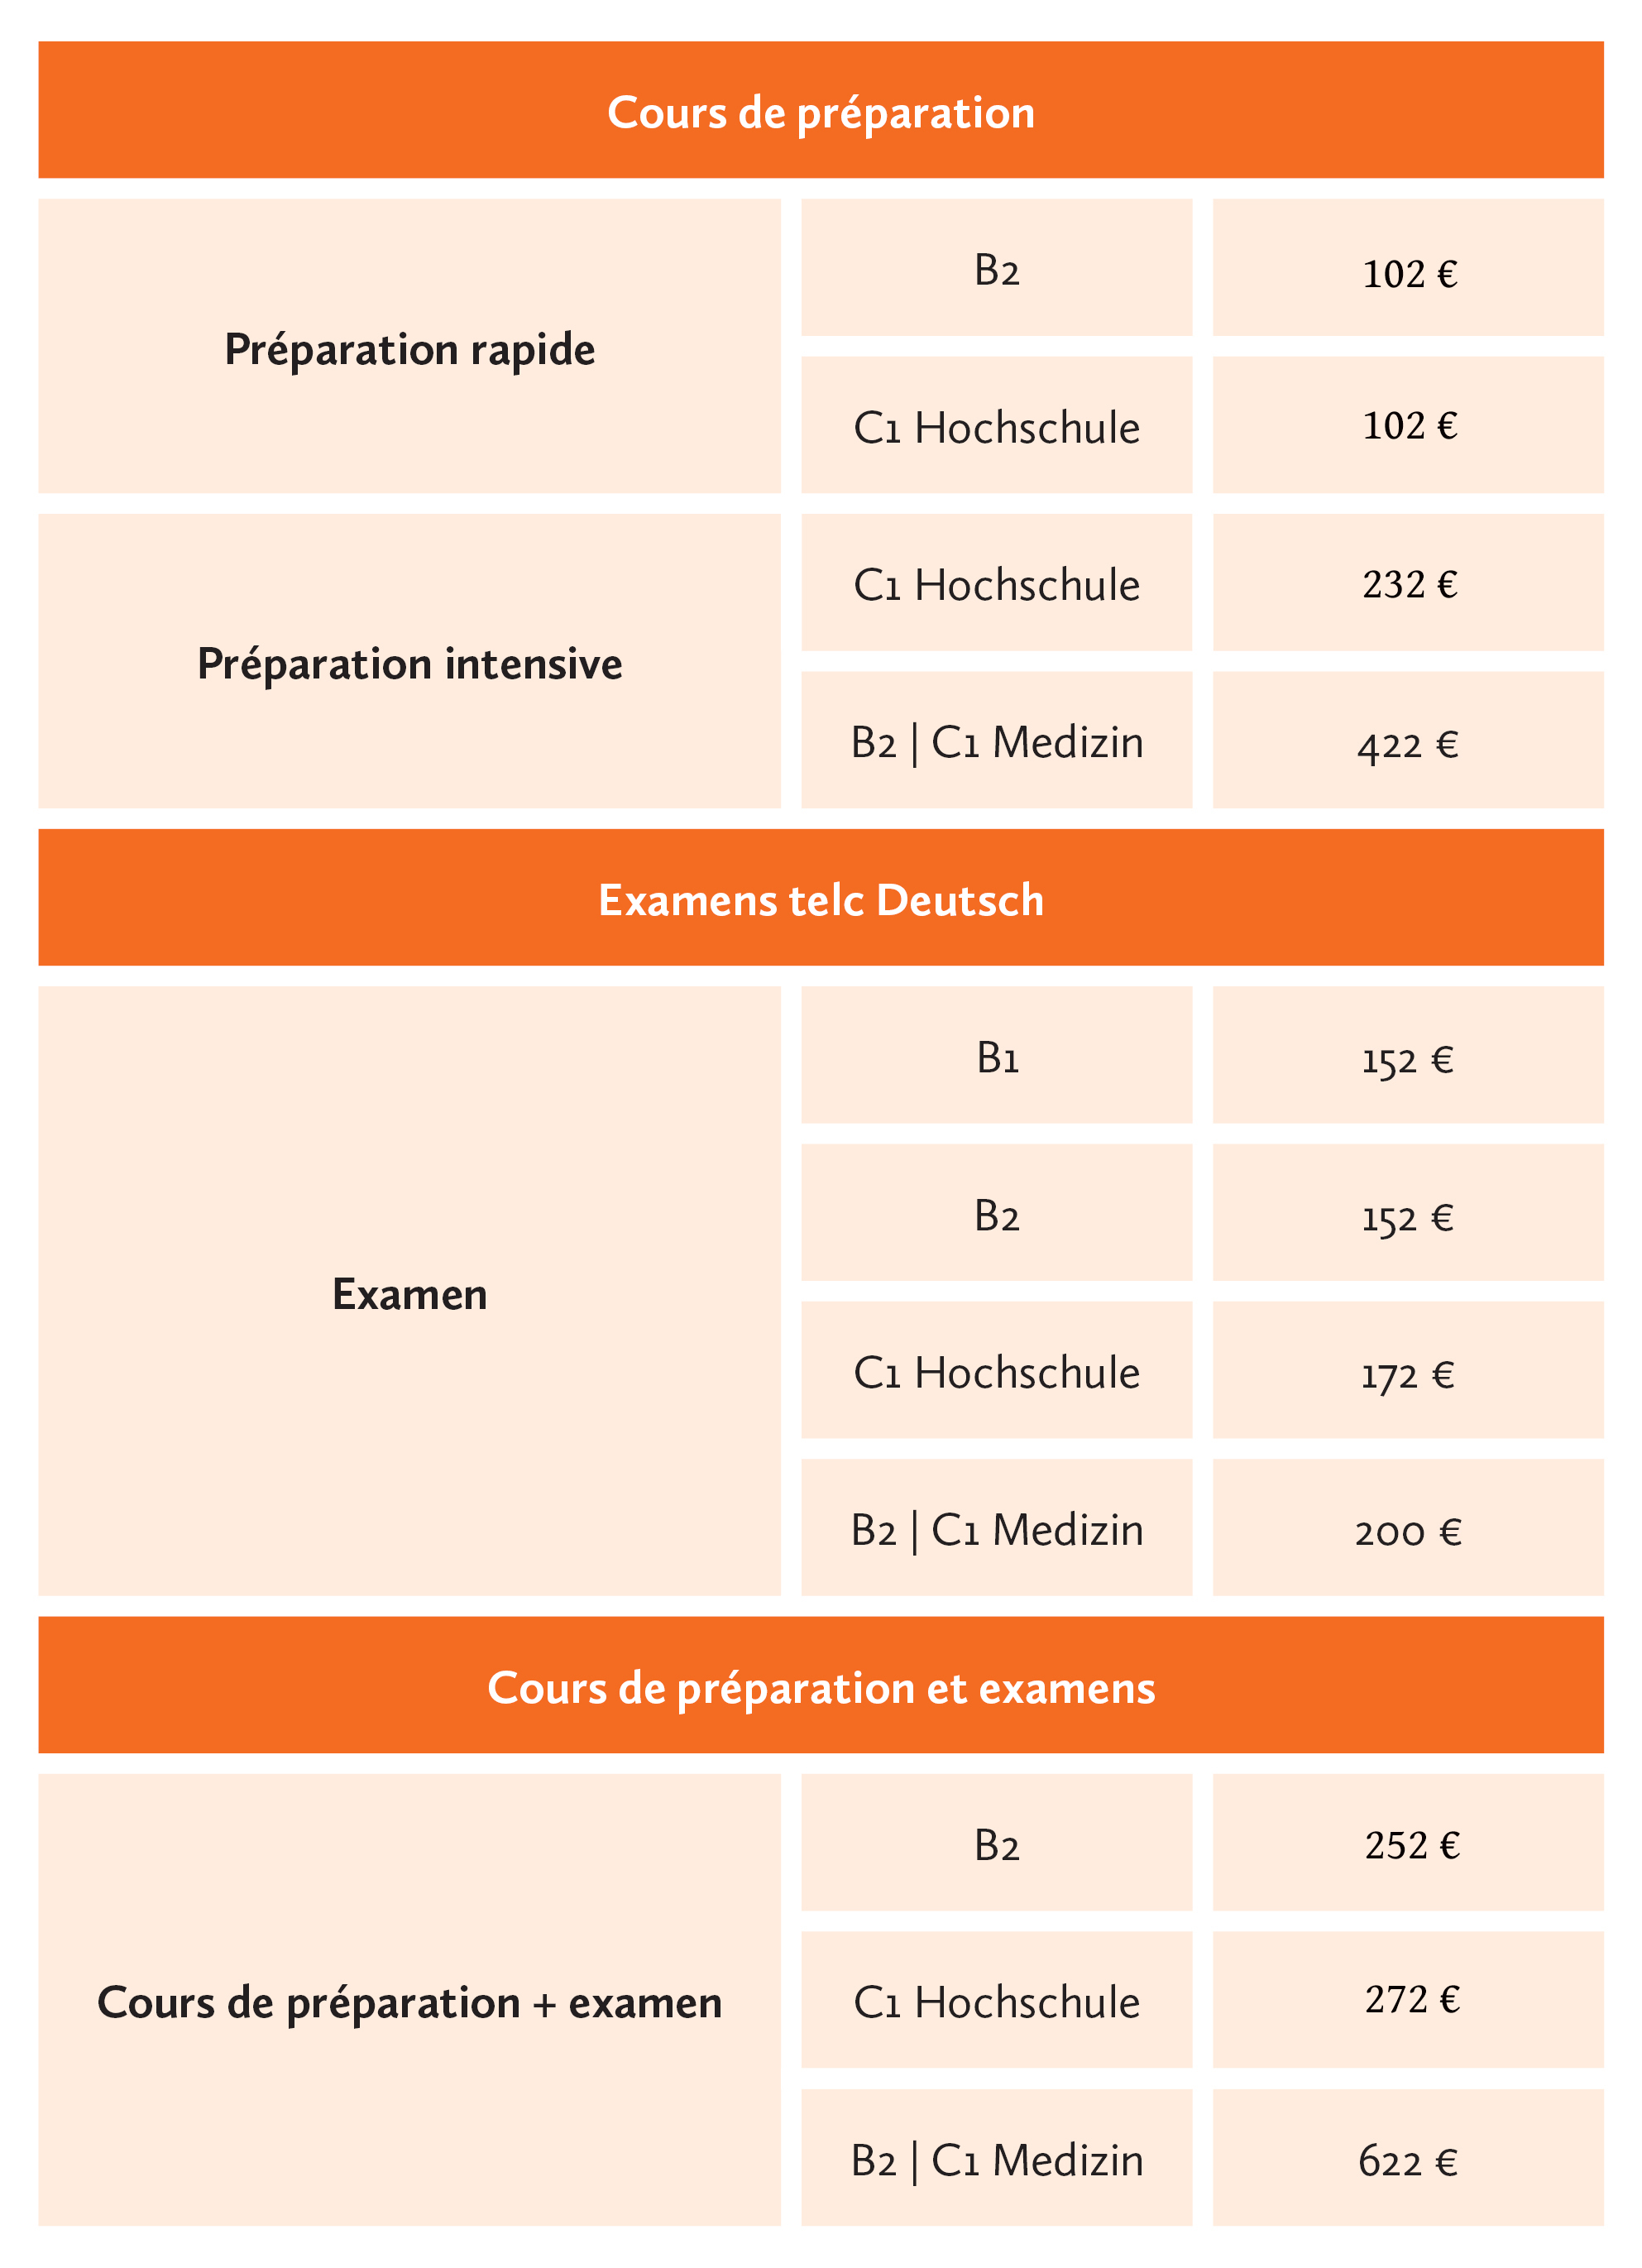 cours de preparation telc Berlin Ecole allemande